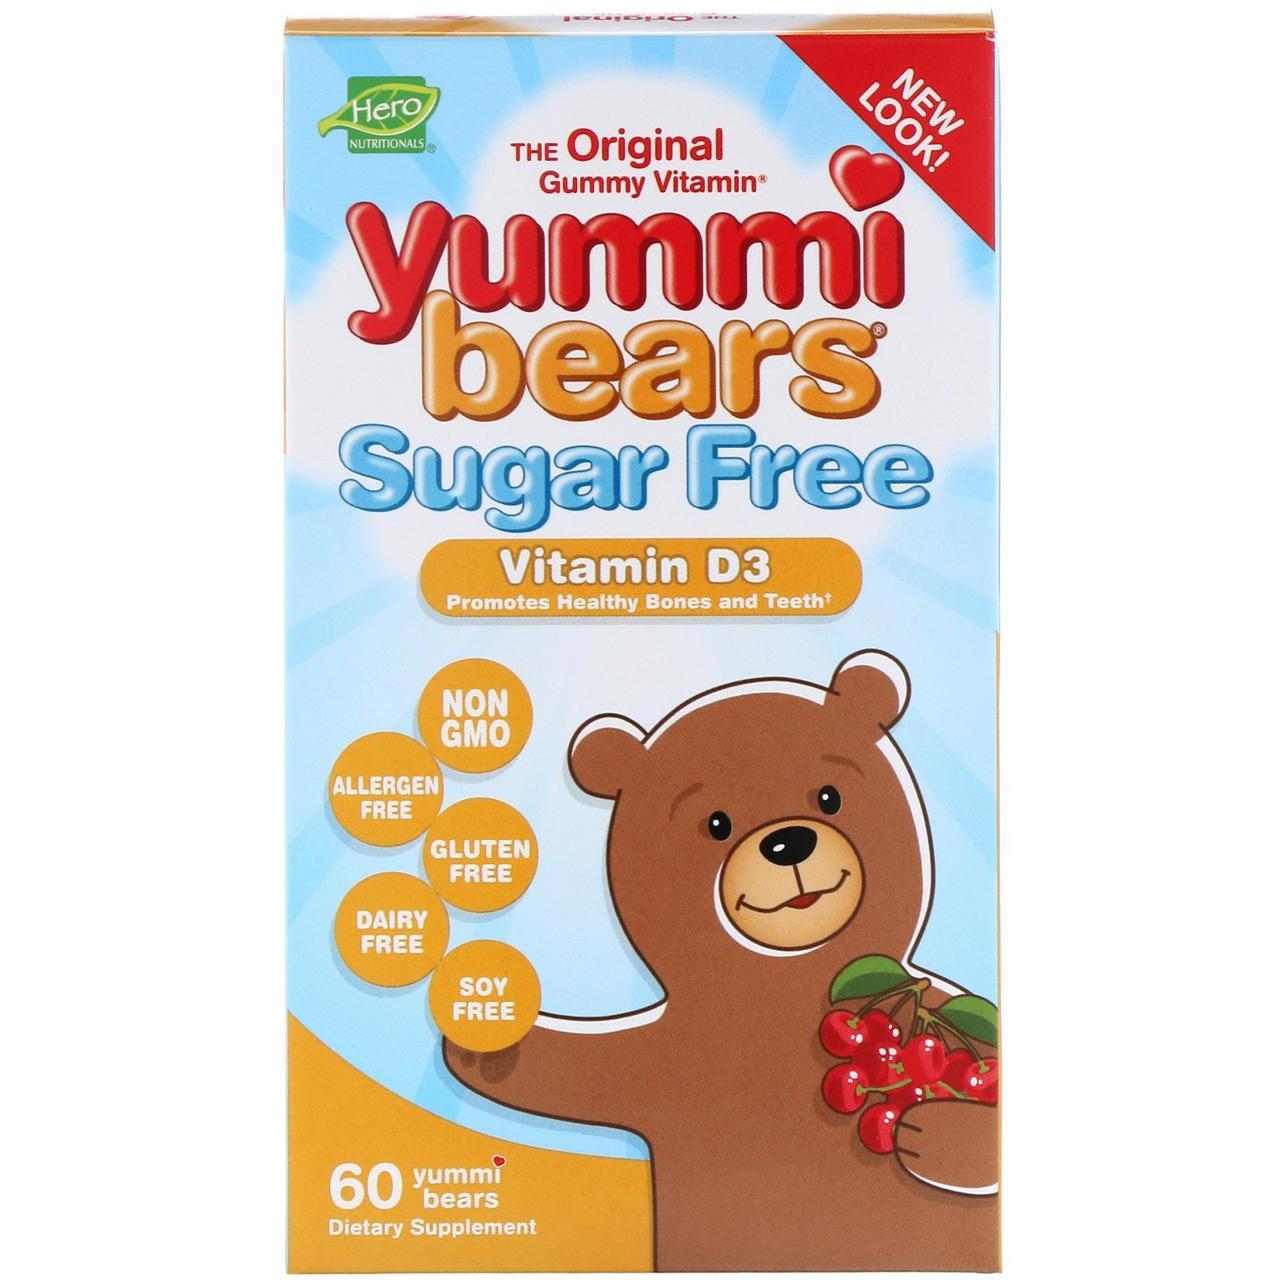 Витамин D3 без сахара для детей, Yummi Bears, Vitamin D3, Hero Nutritional Products, 1000 МЕ, 60 штук